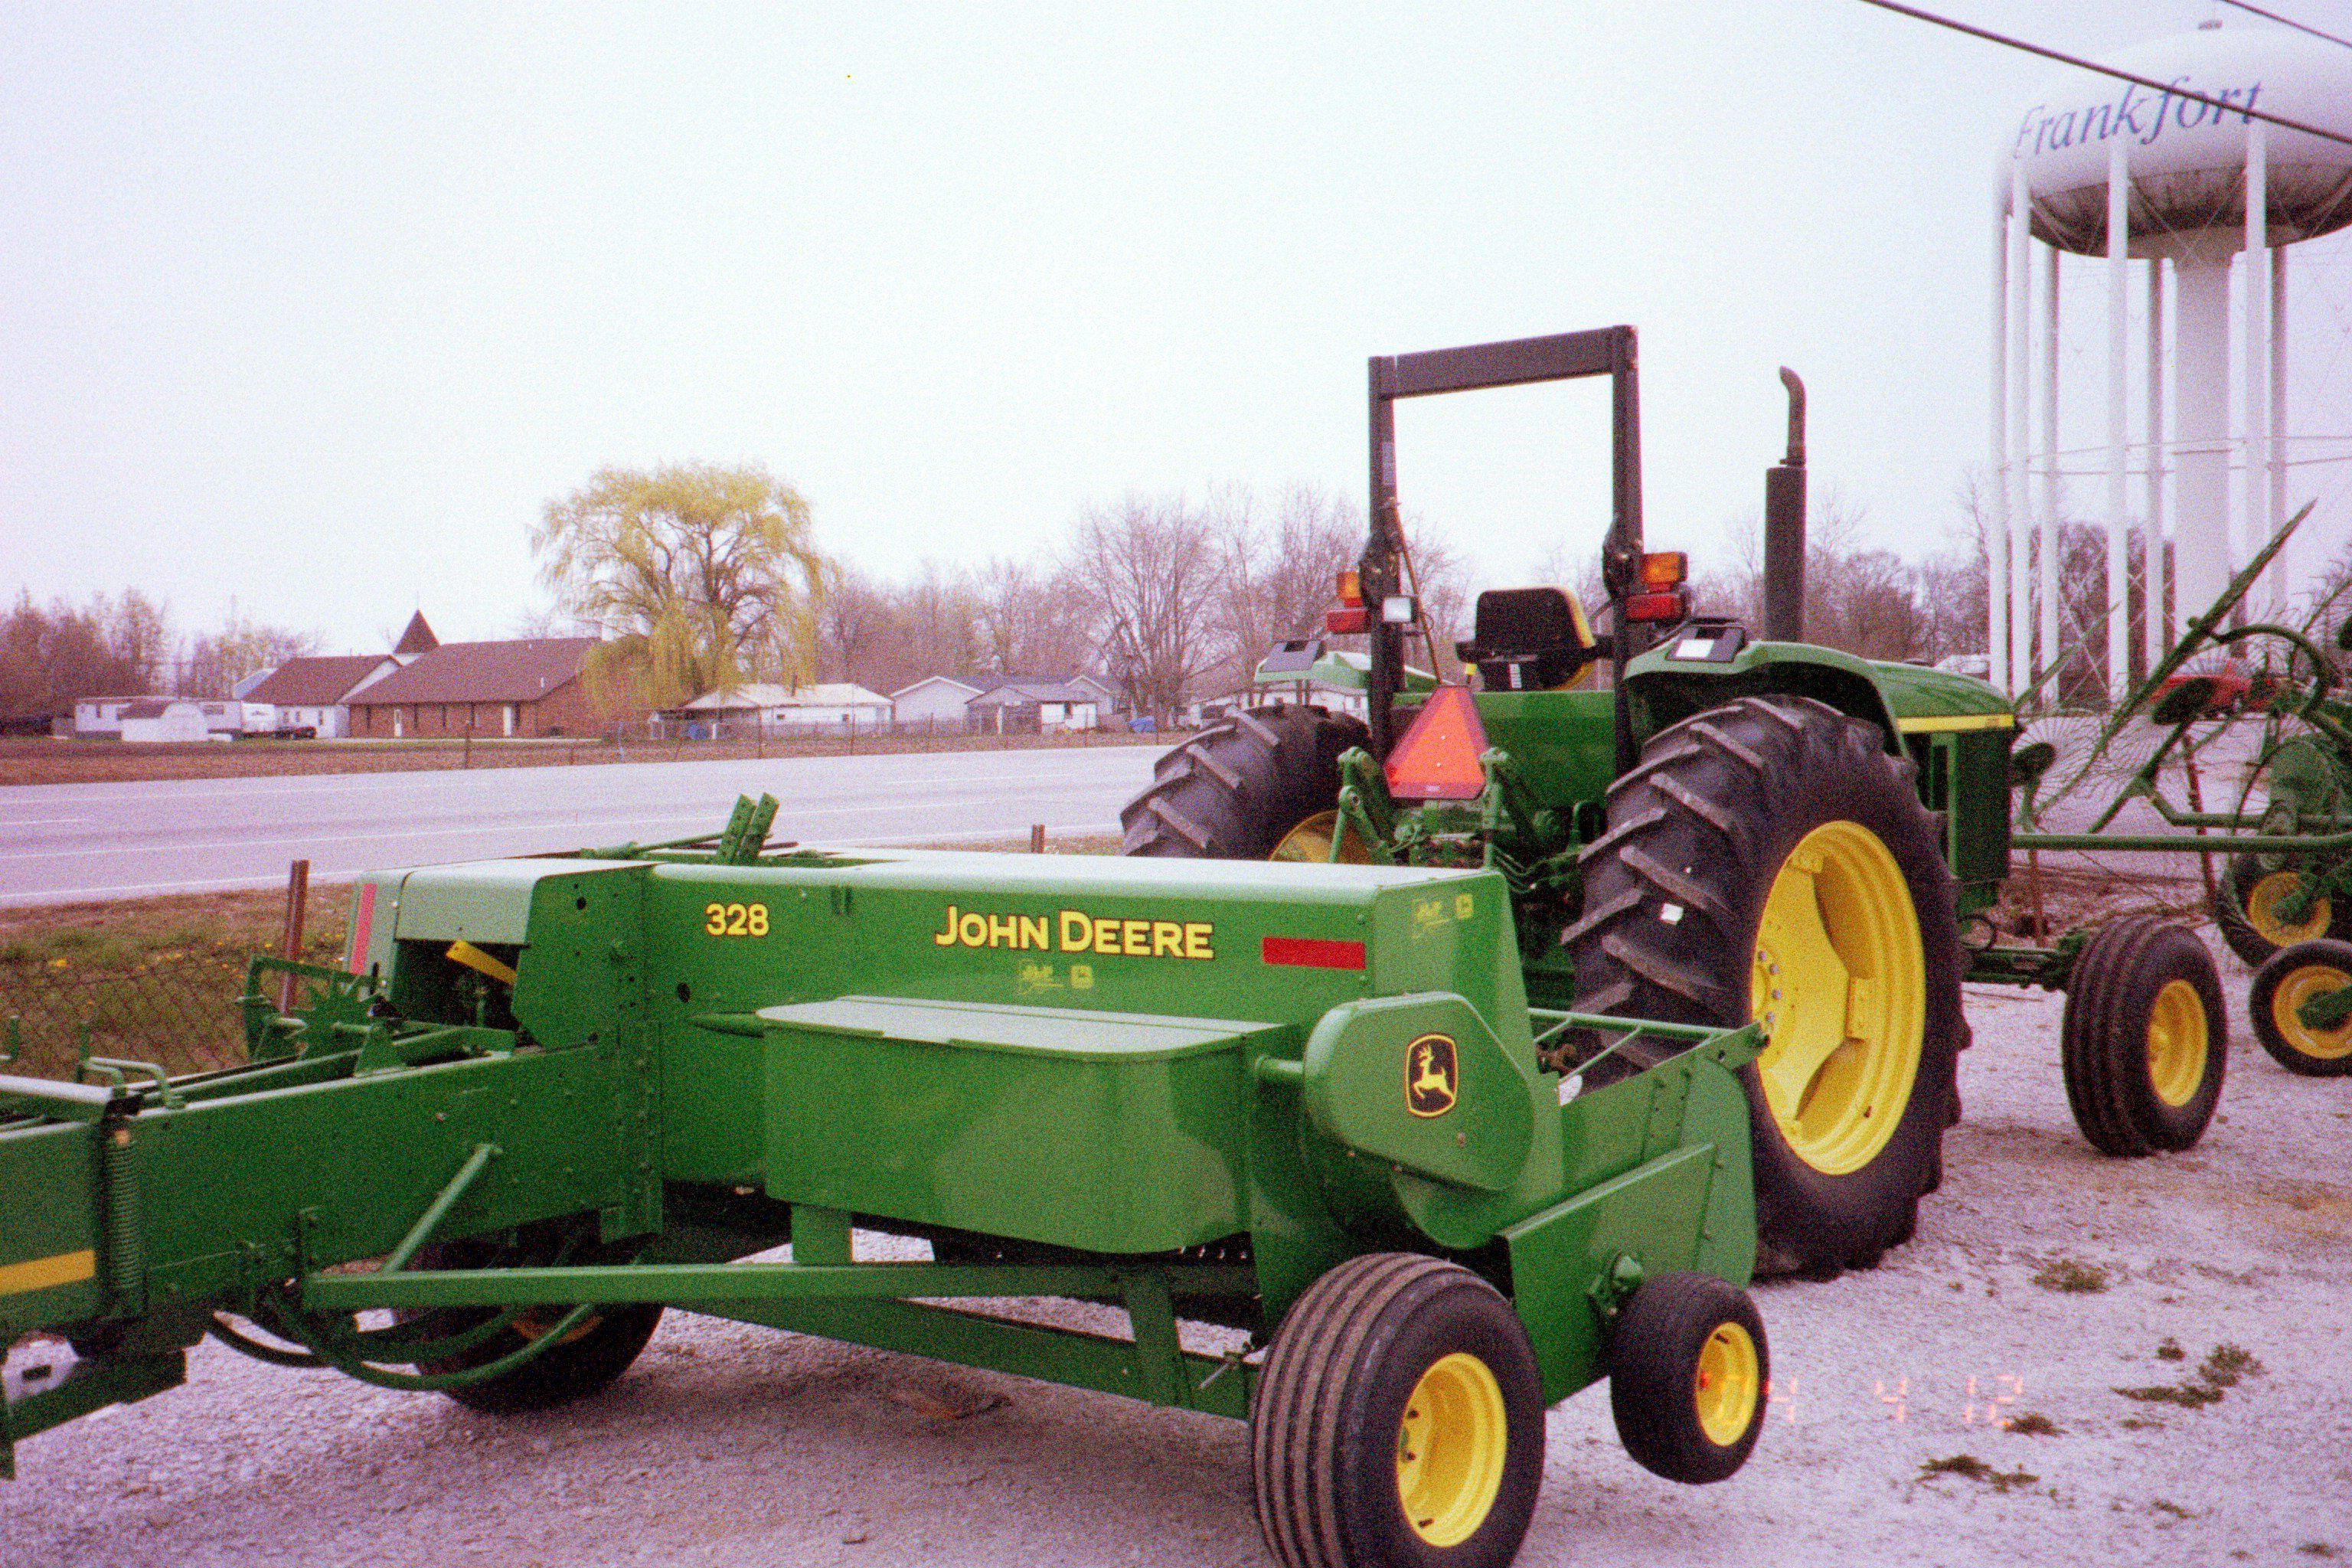 John Deere 6603 towing 328 square baler | JD Farm Equip-my